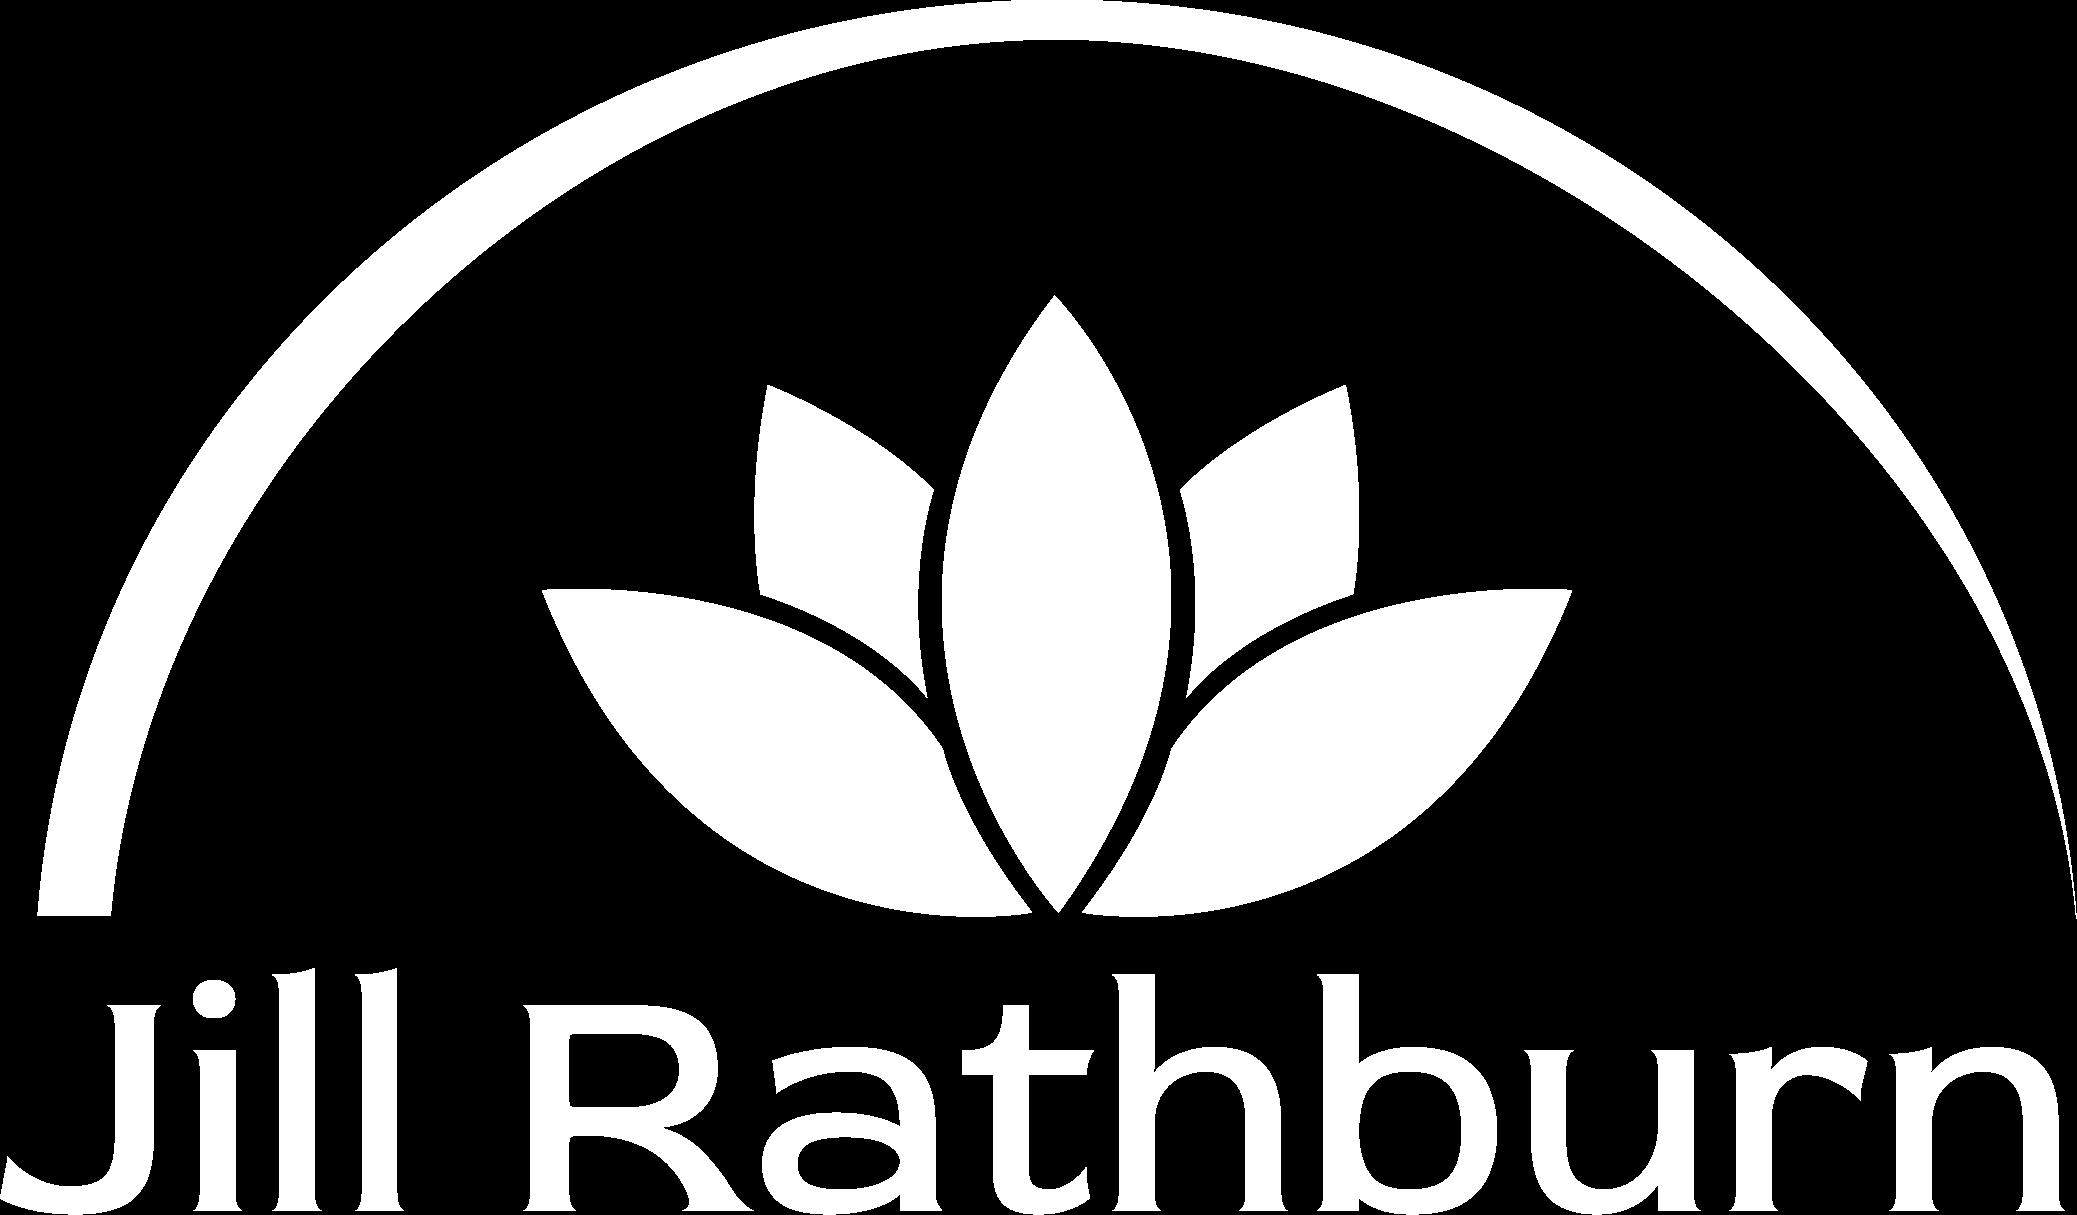 jill rathburn logo reverse